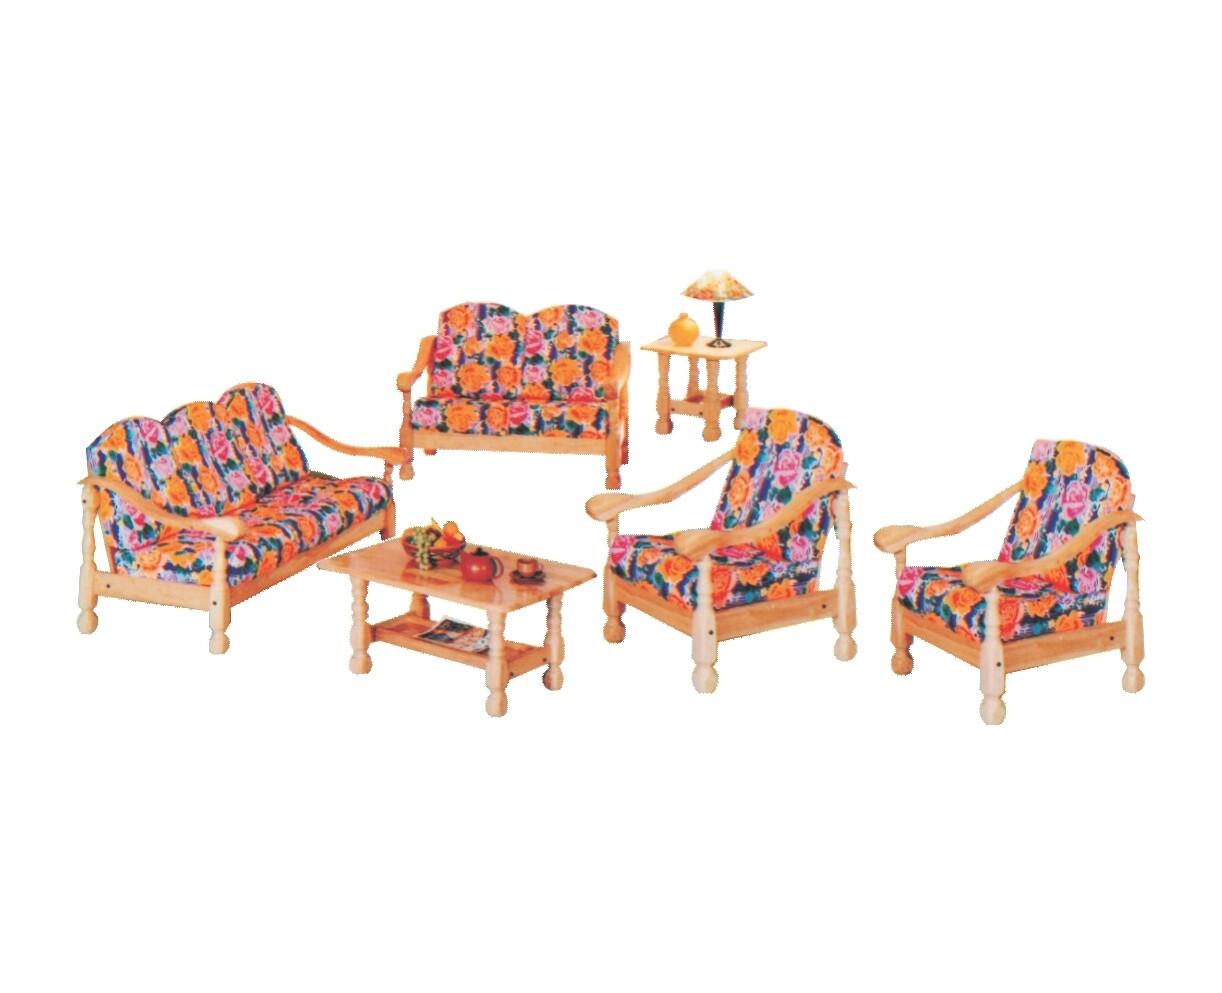 1+2+3 sofa seat